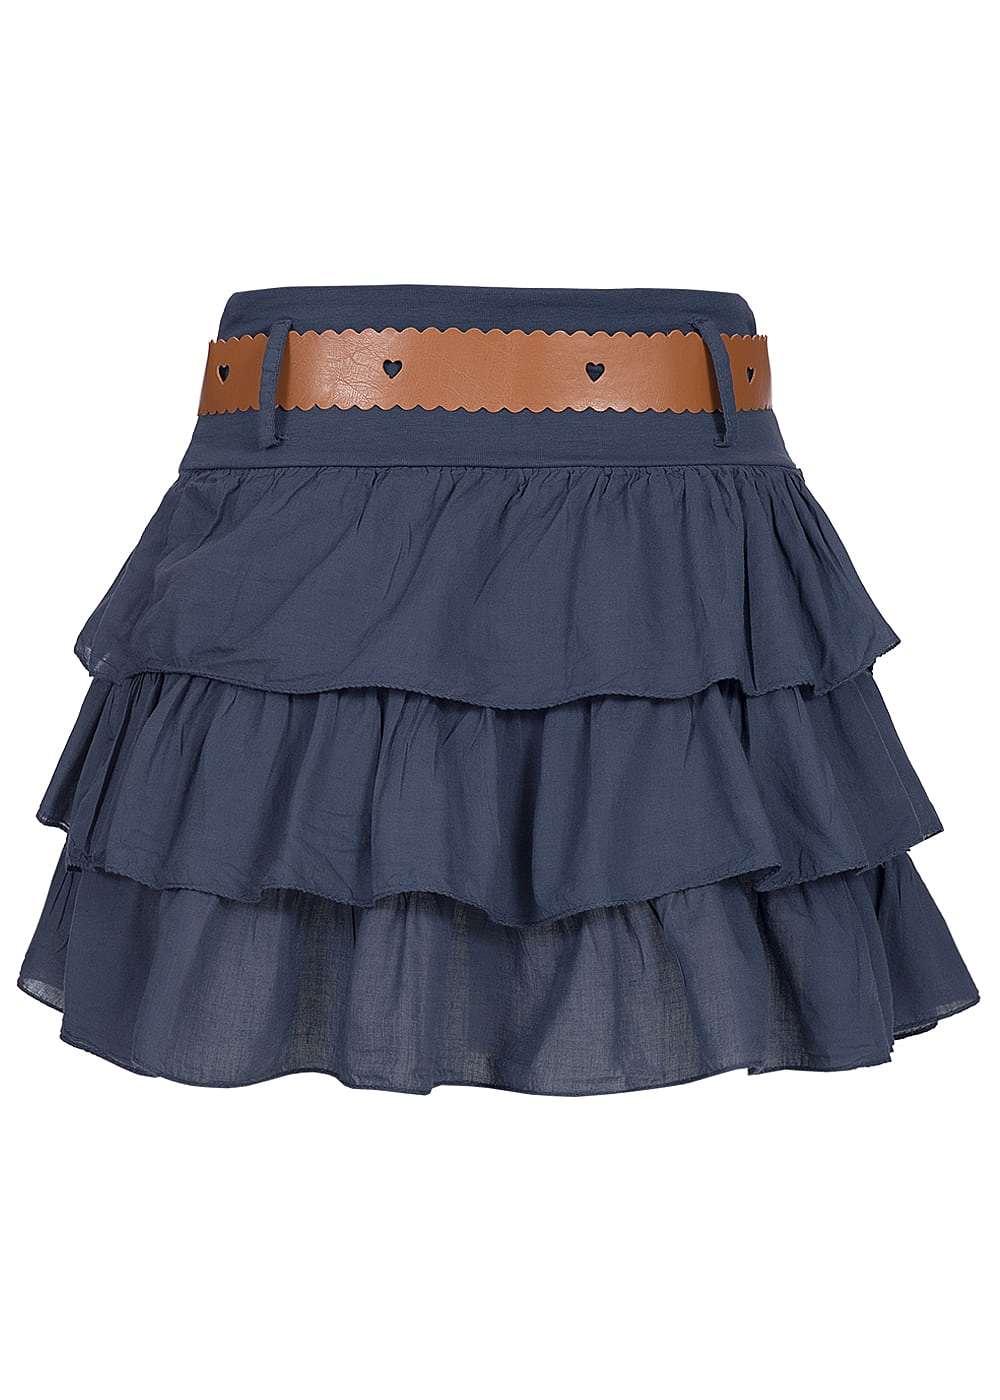 styleboom fashion damen mini stufenrock mit g rtel gummizug navy 77onlineshop. Black Bedroom Furniture Sets. Home Design Ideas